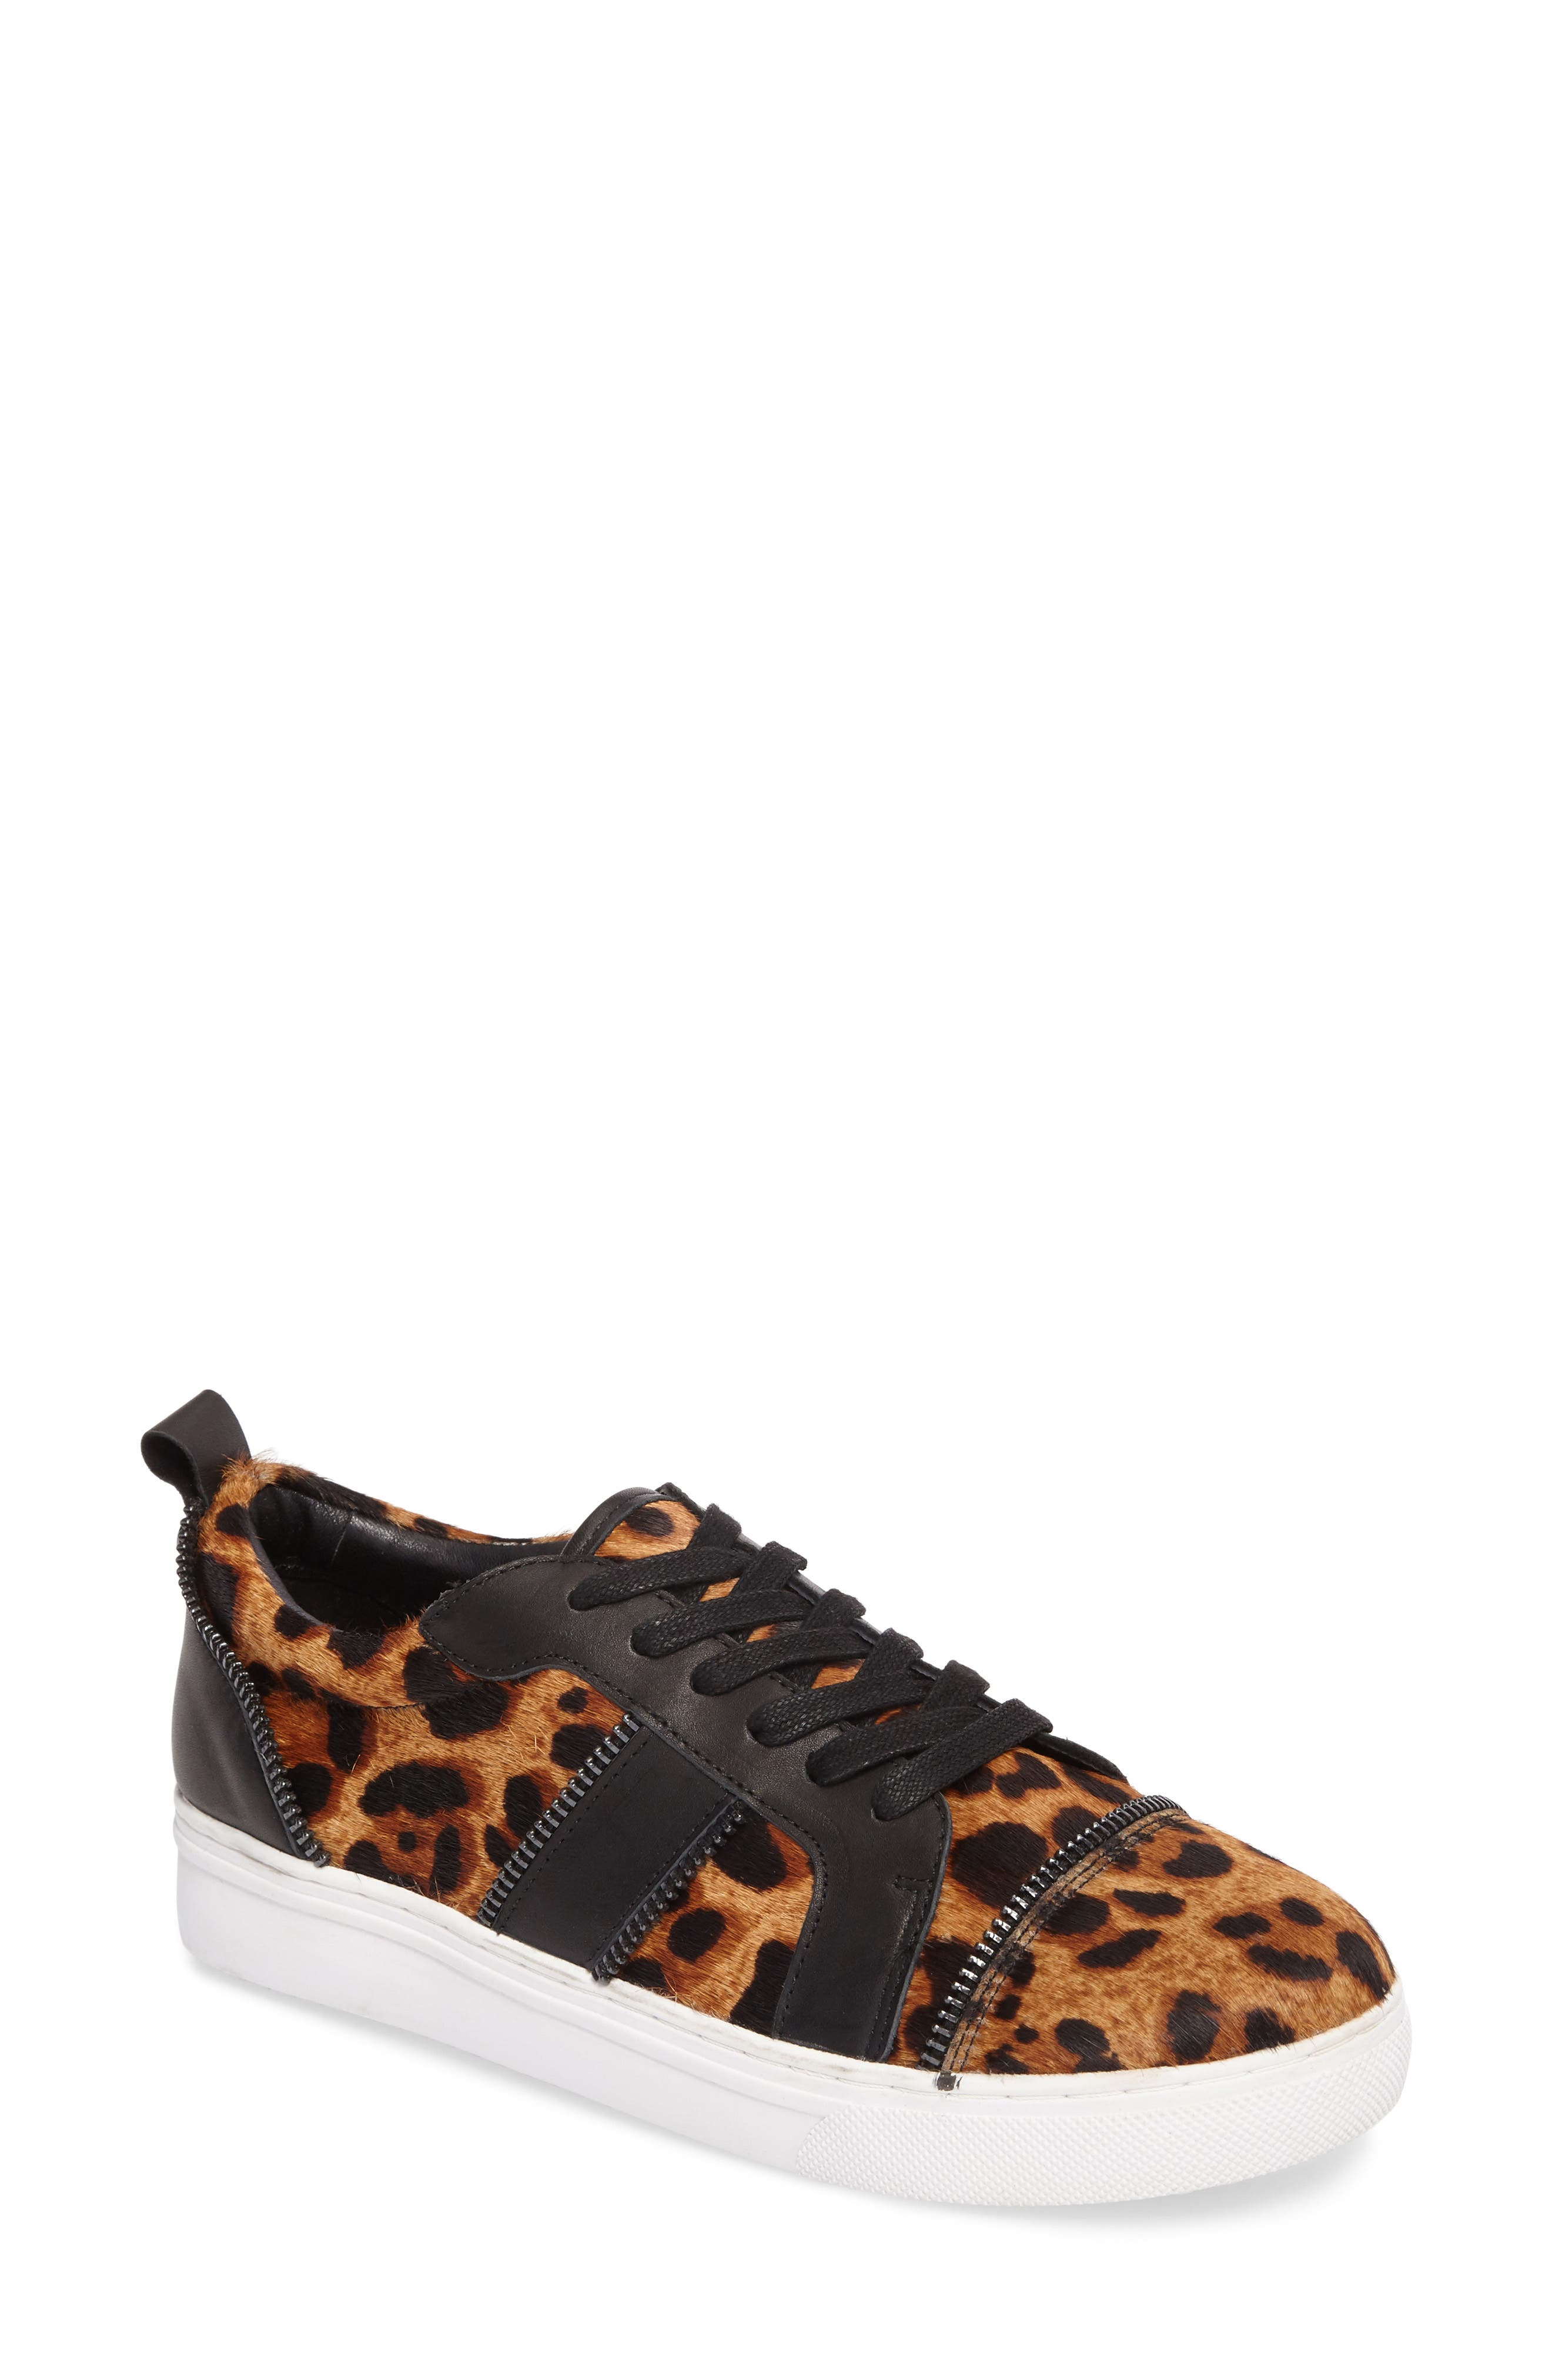 Harvey Genuine Calf Hair Sneaker,                         Main,                         color, Leopard Calf Hair